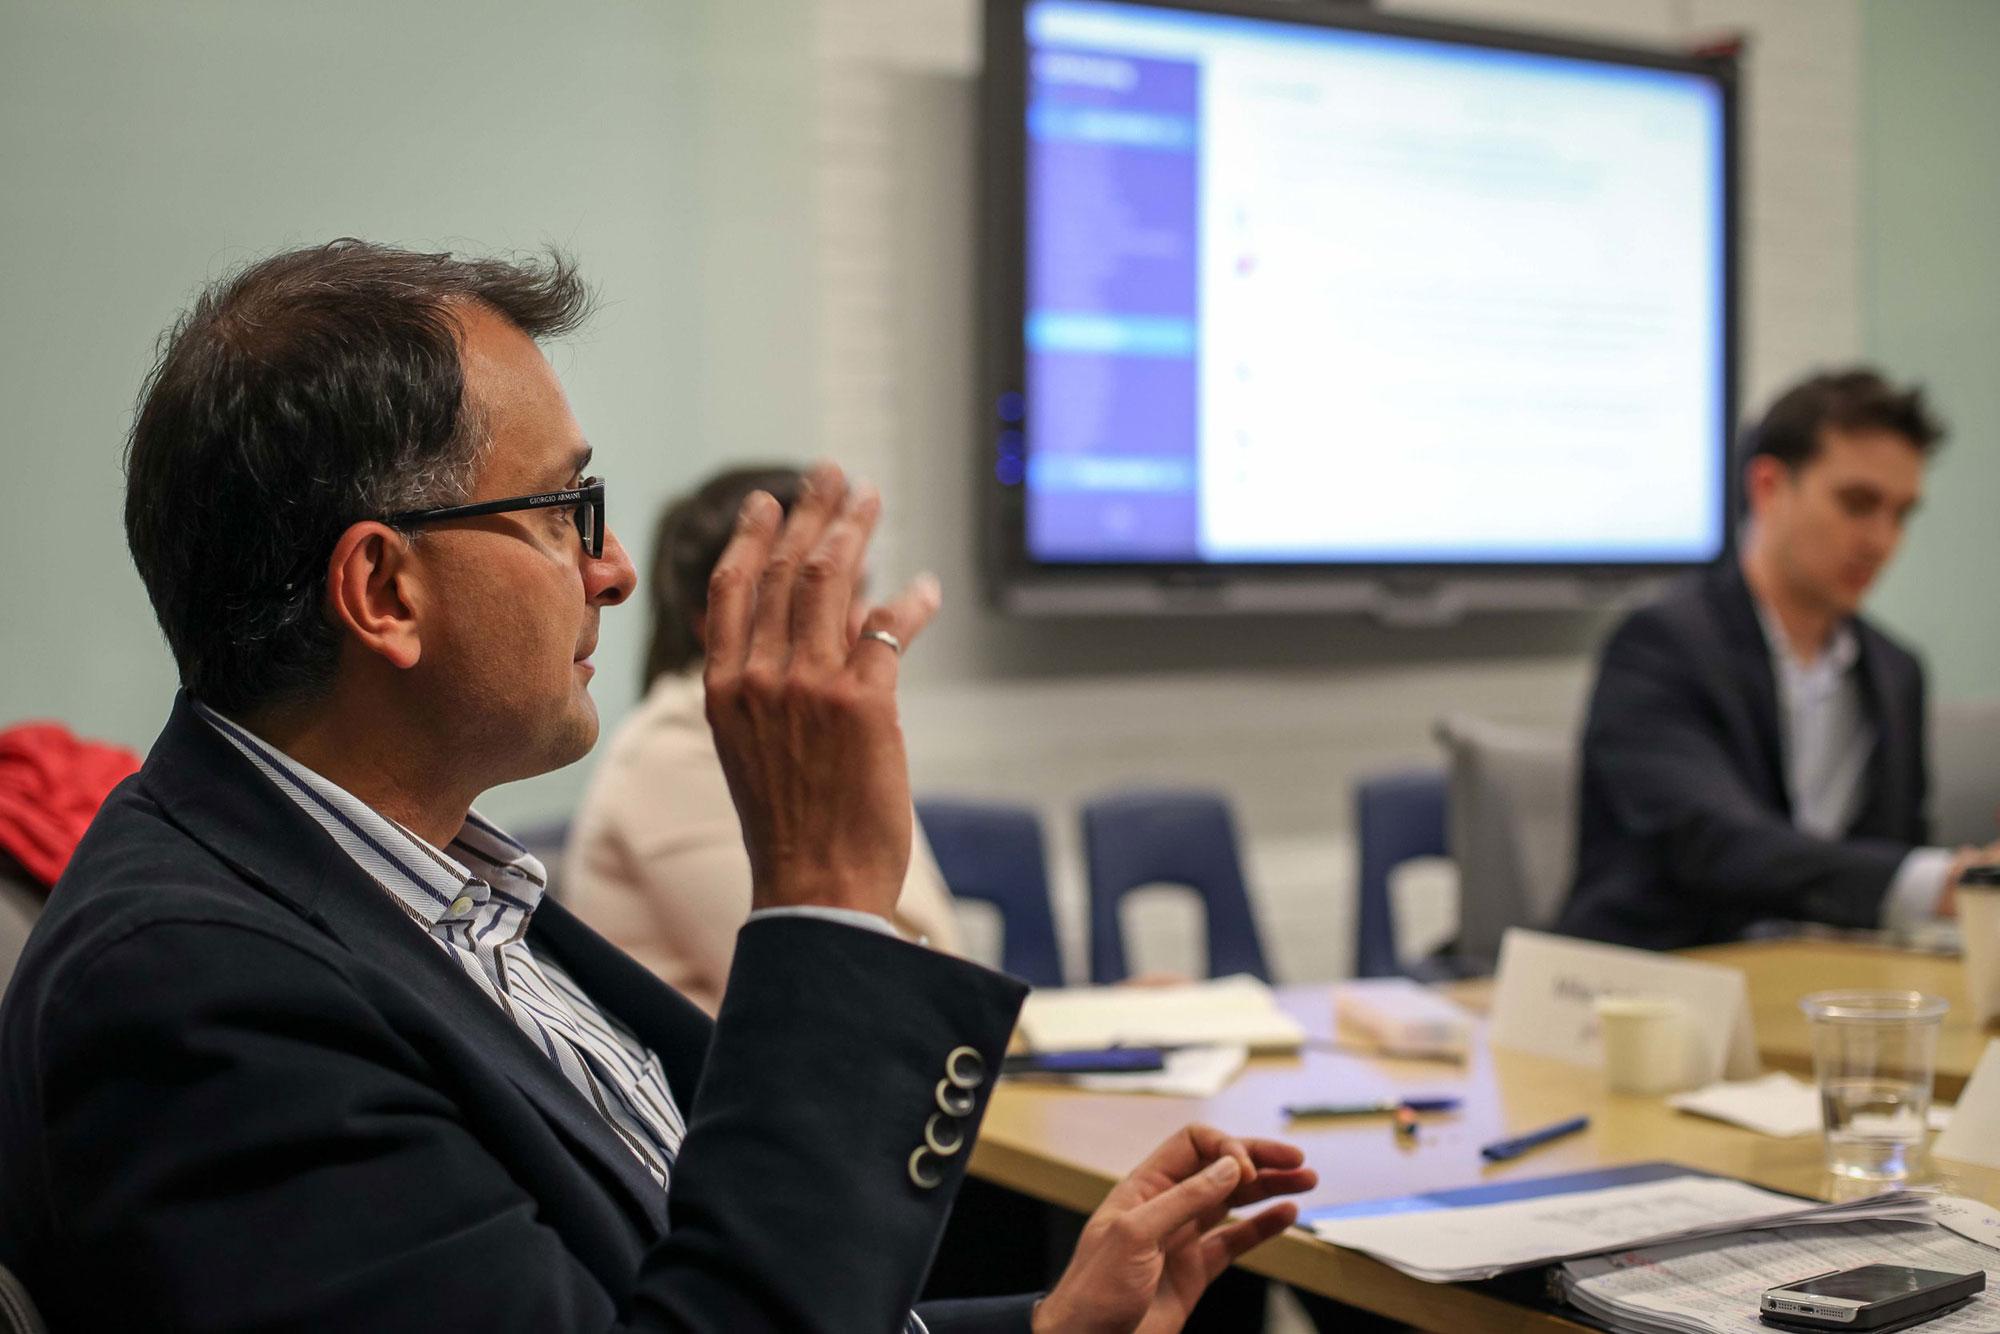 Professor-Ajay-Agrawal-Teaching.jpg